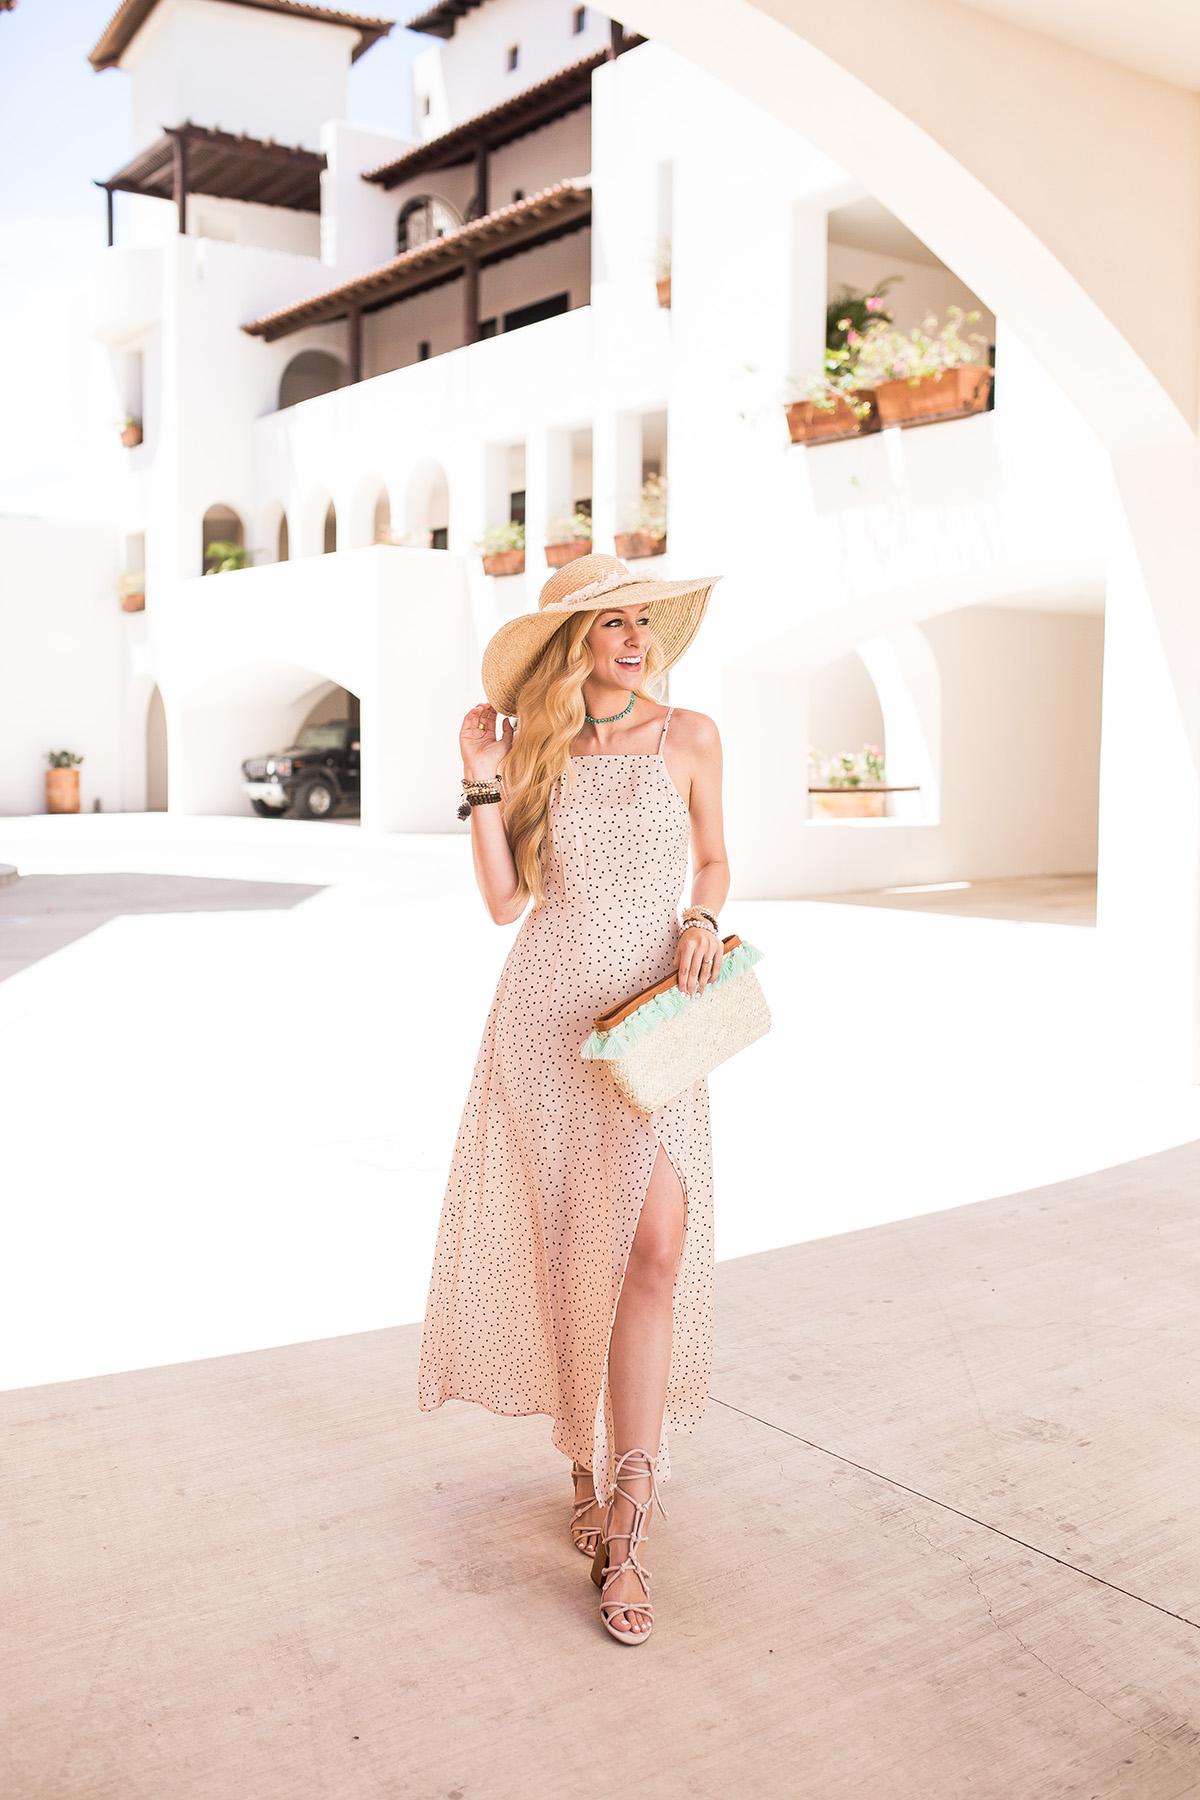 Express x Karlie Kloss | polka dot maxi dress | blush maxi dress | vacation outfit idea